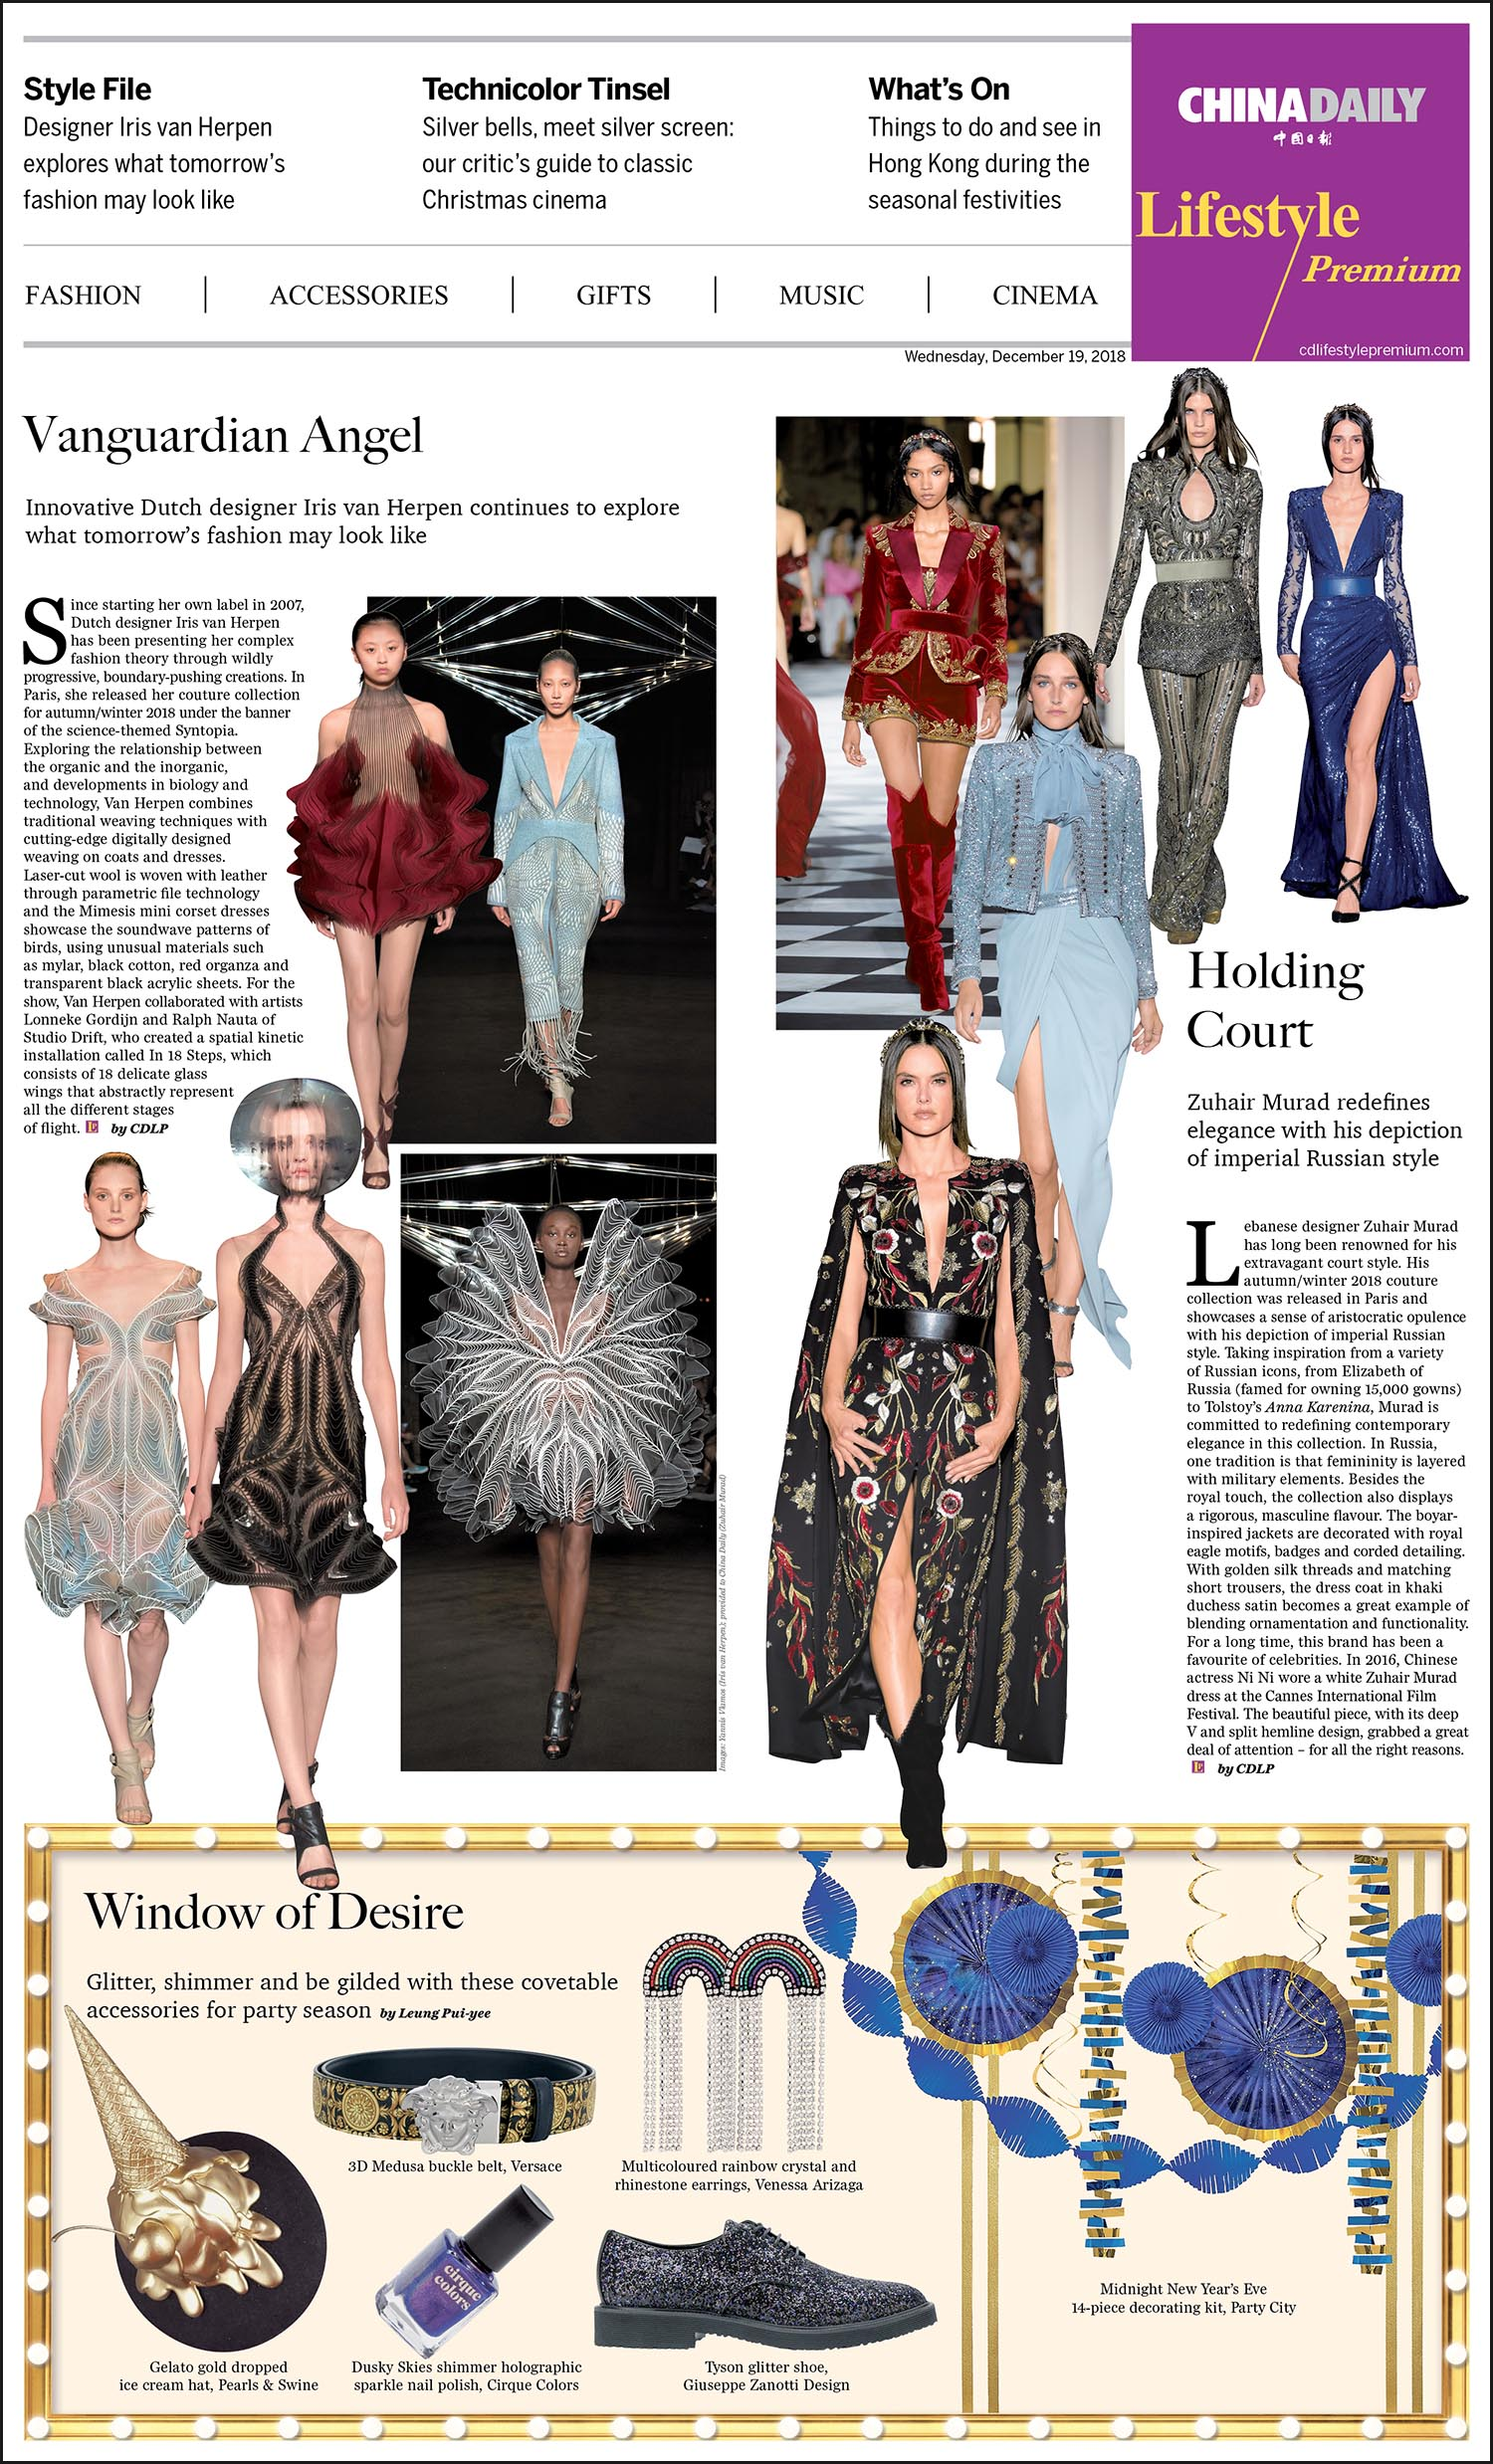 December 19 Issue